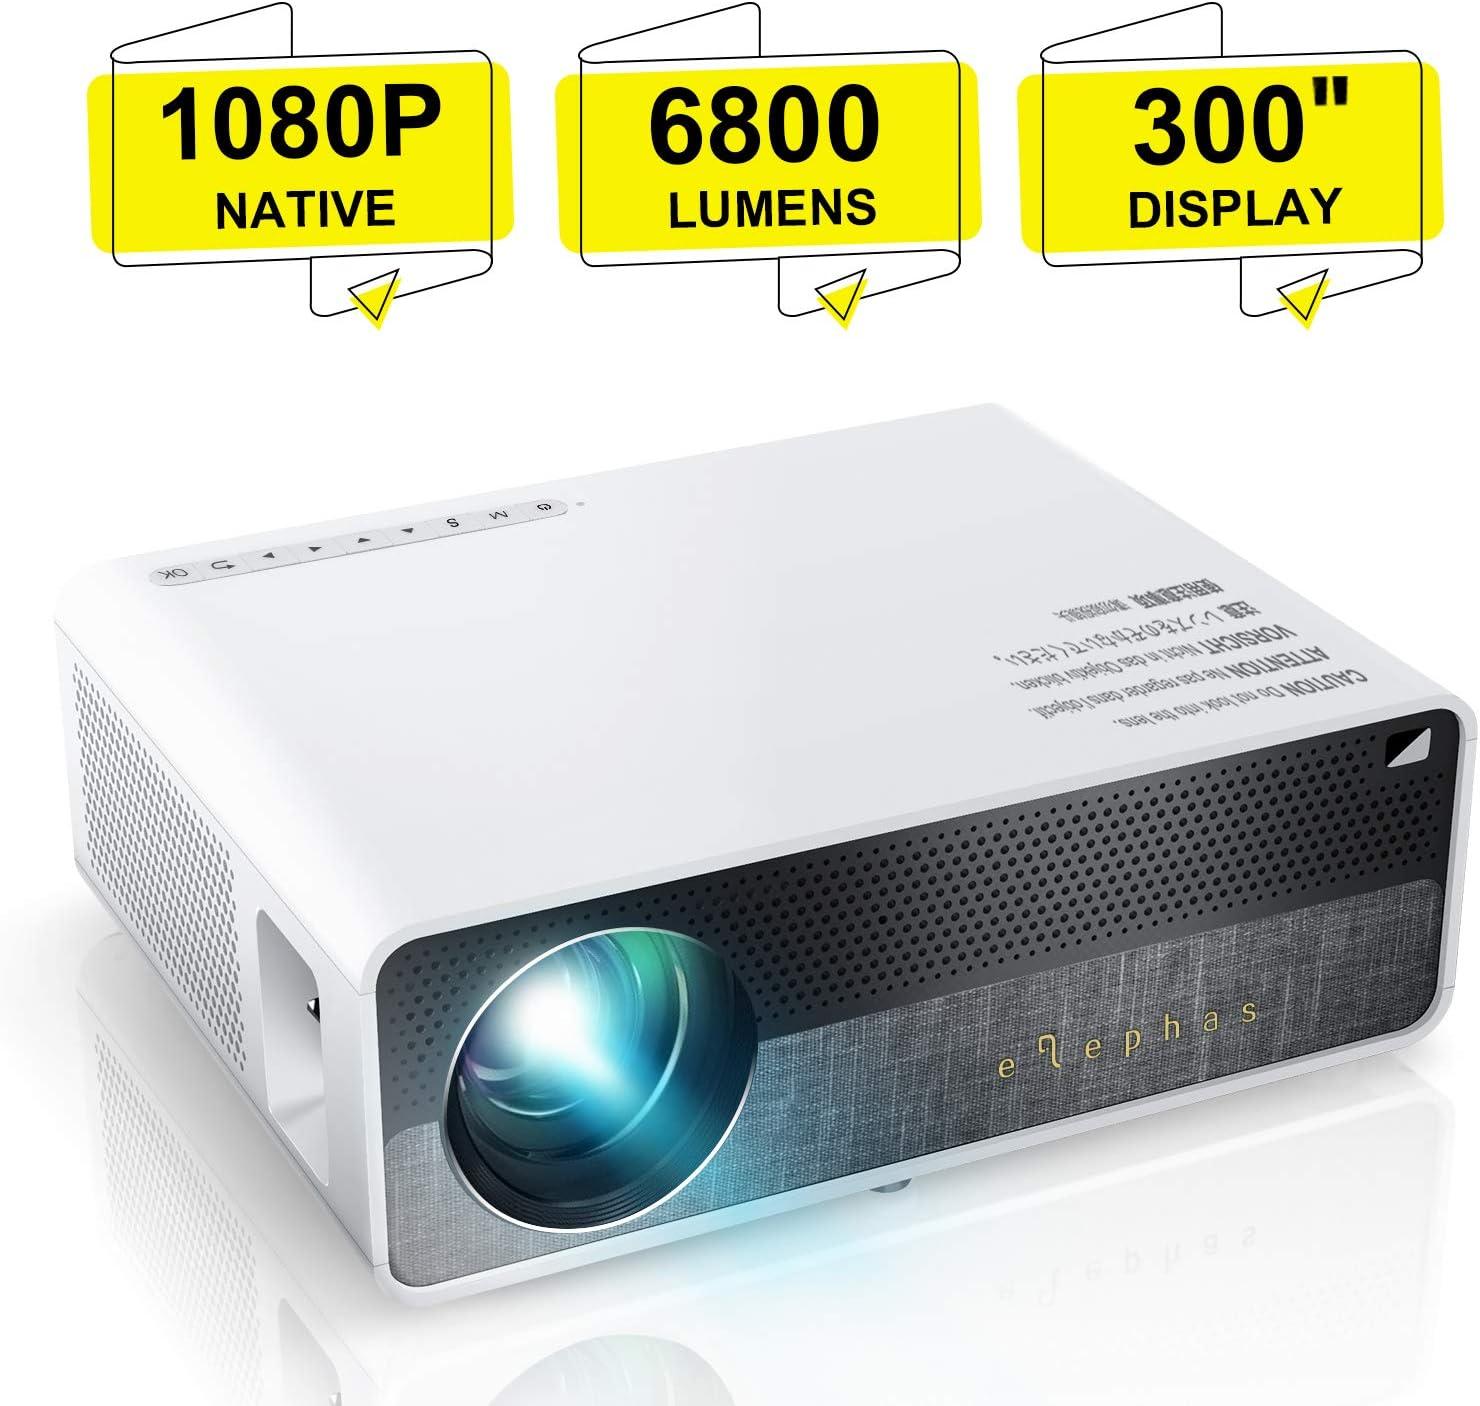 Proyector,ELEPHAS 6800 lúmenes Proyector 1080P Nativo de Video HD ...